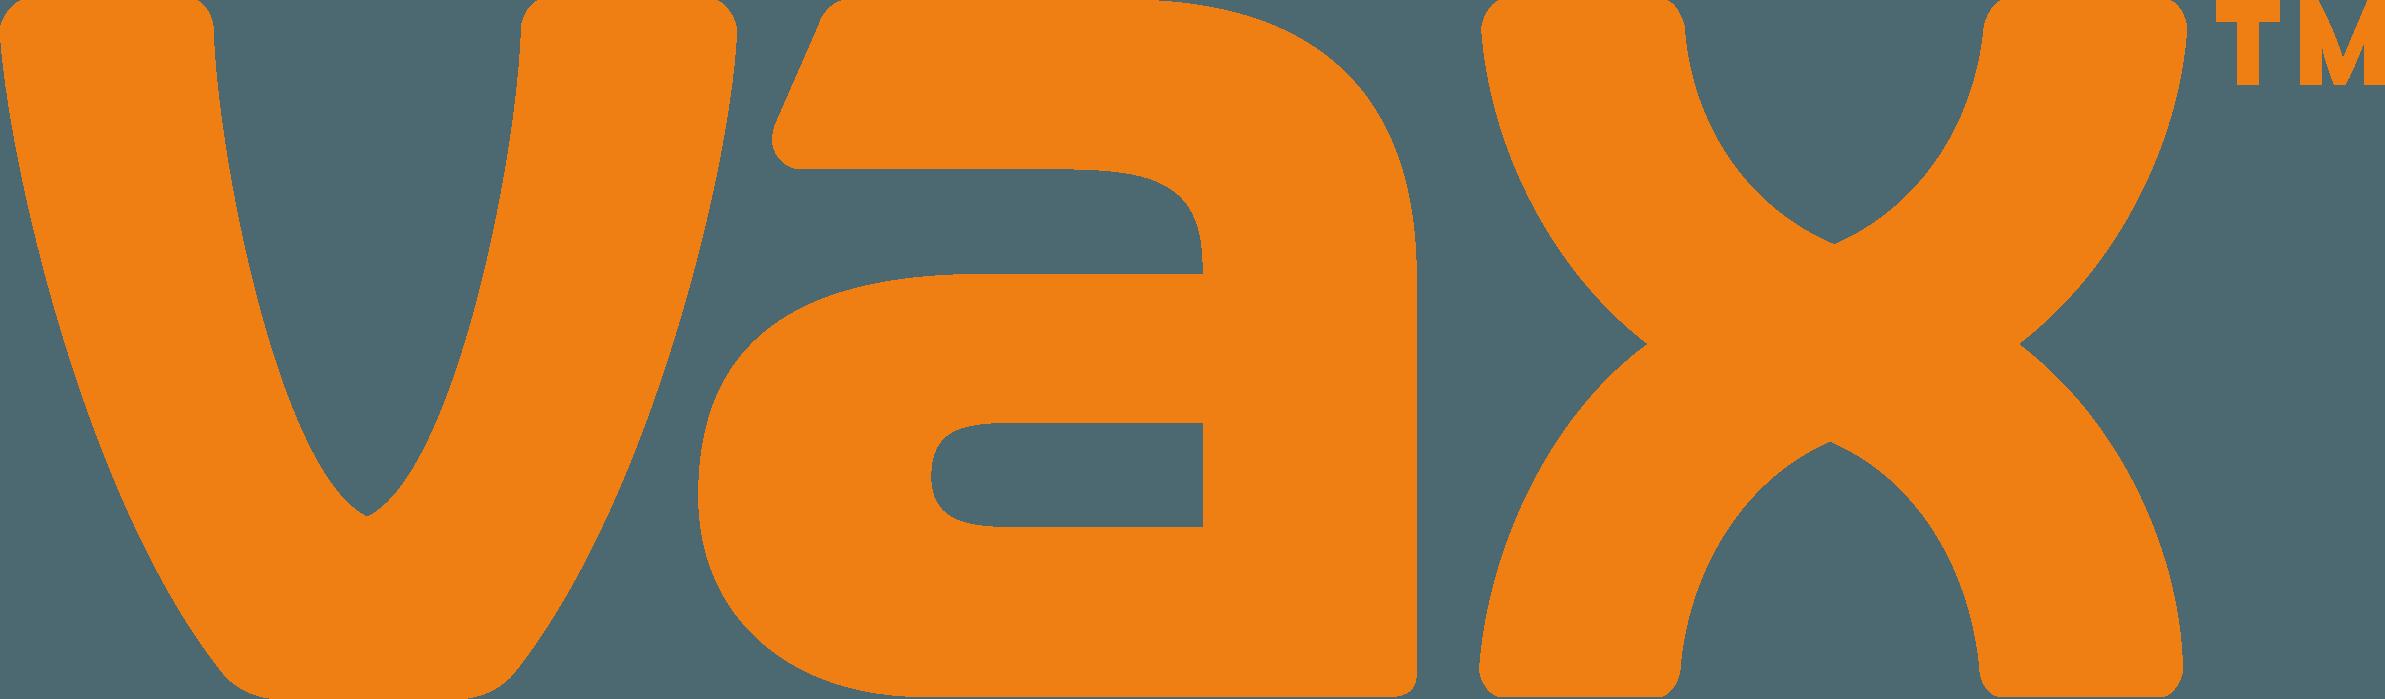 Vax Logo png